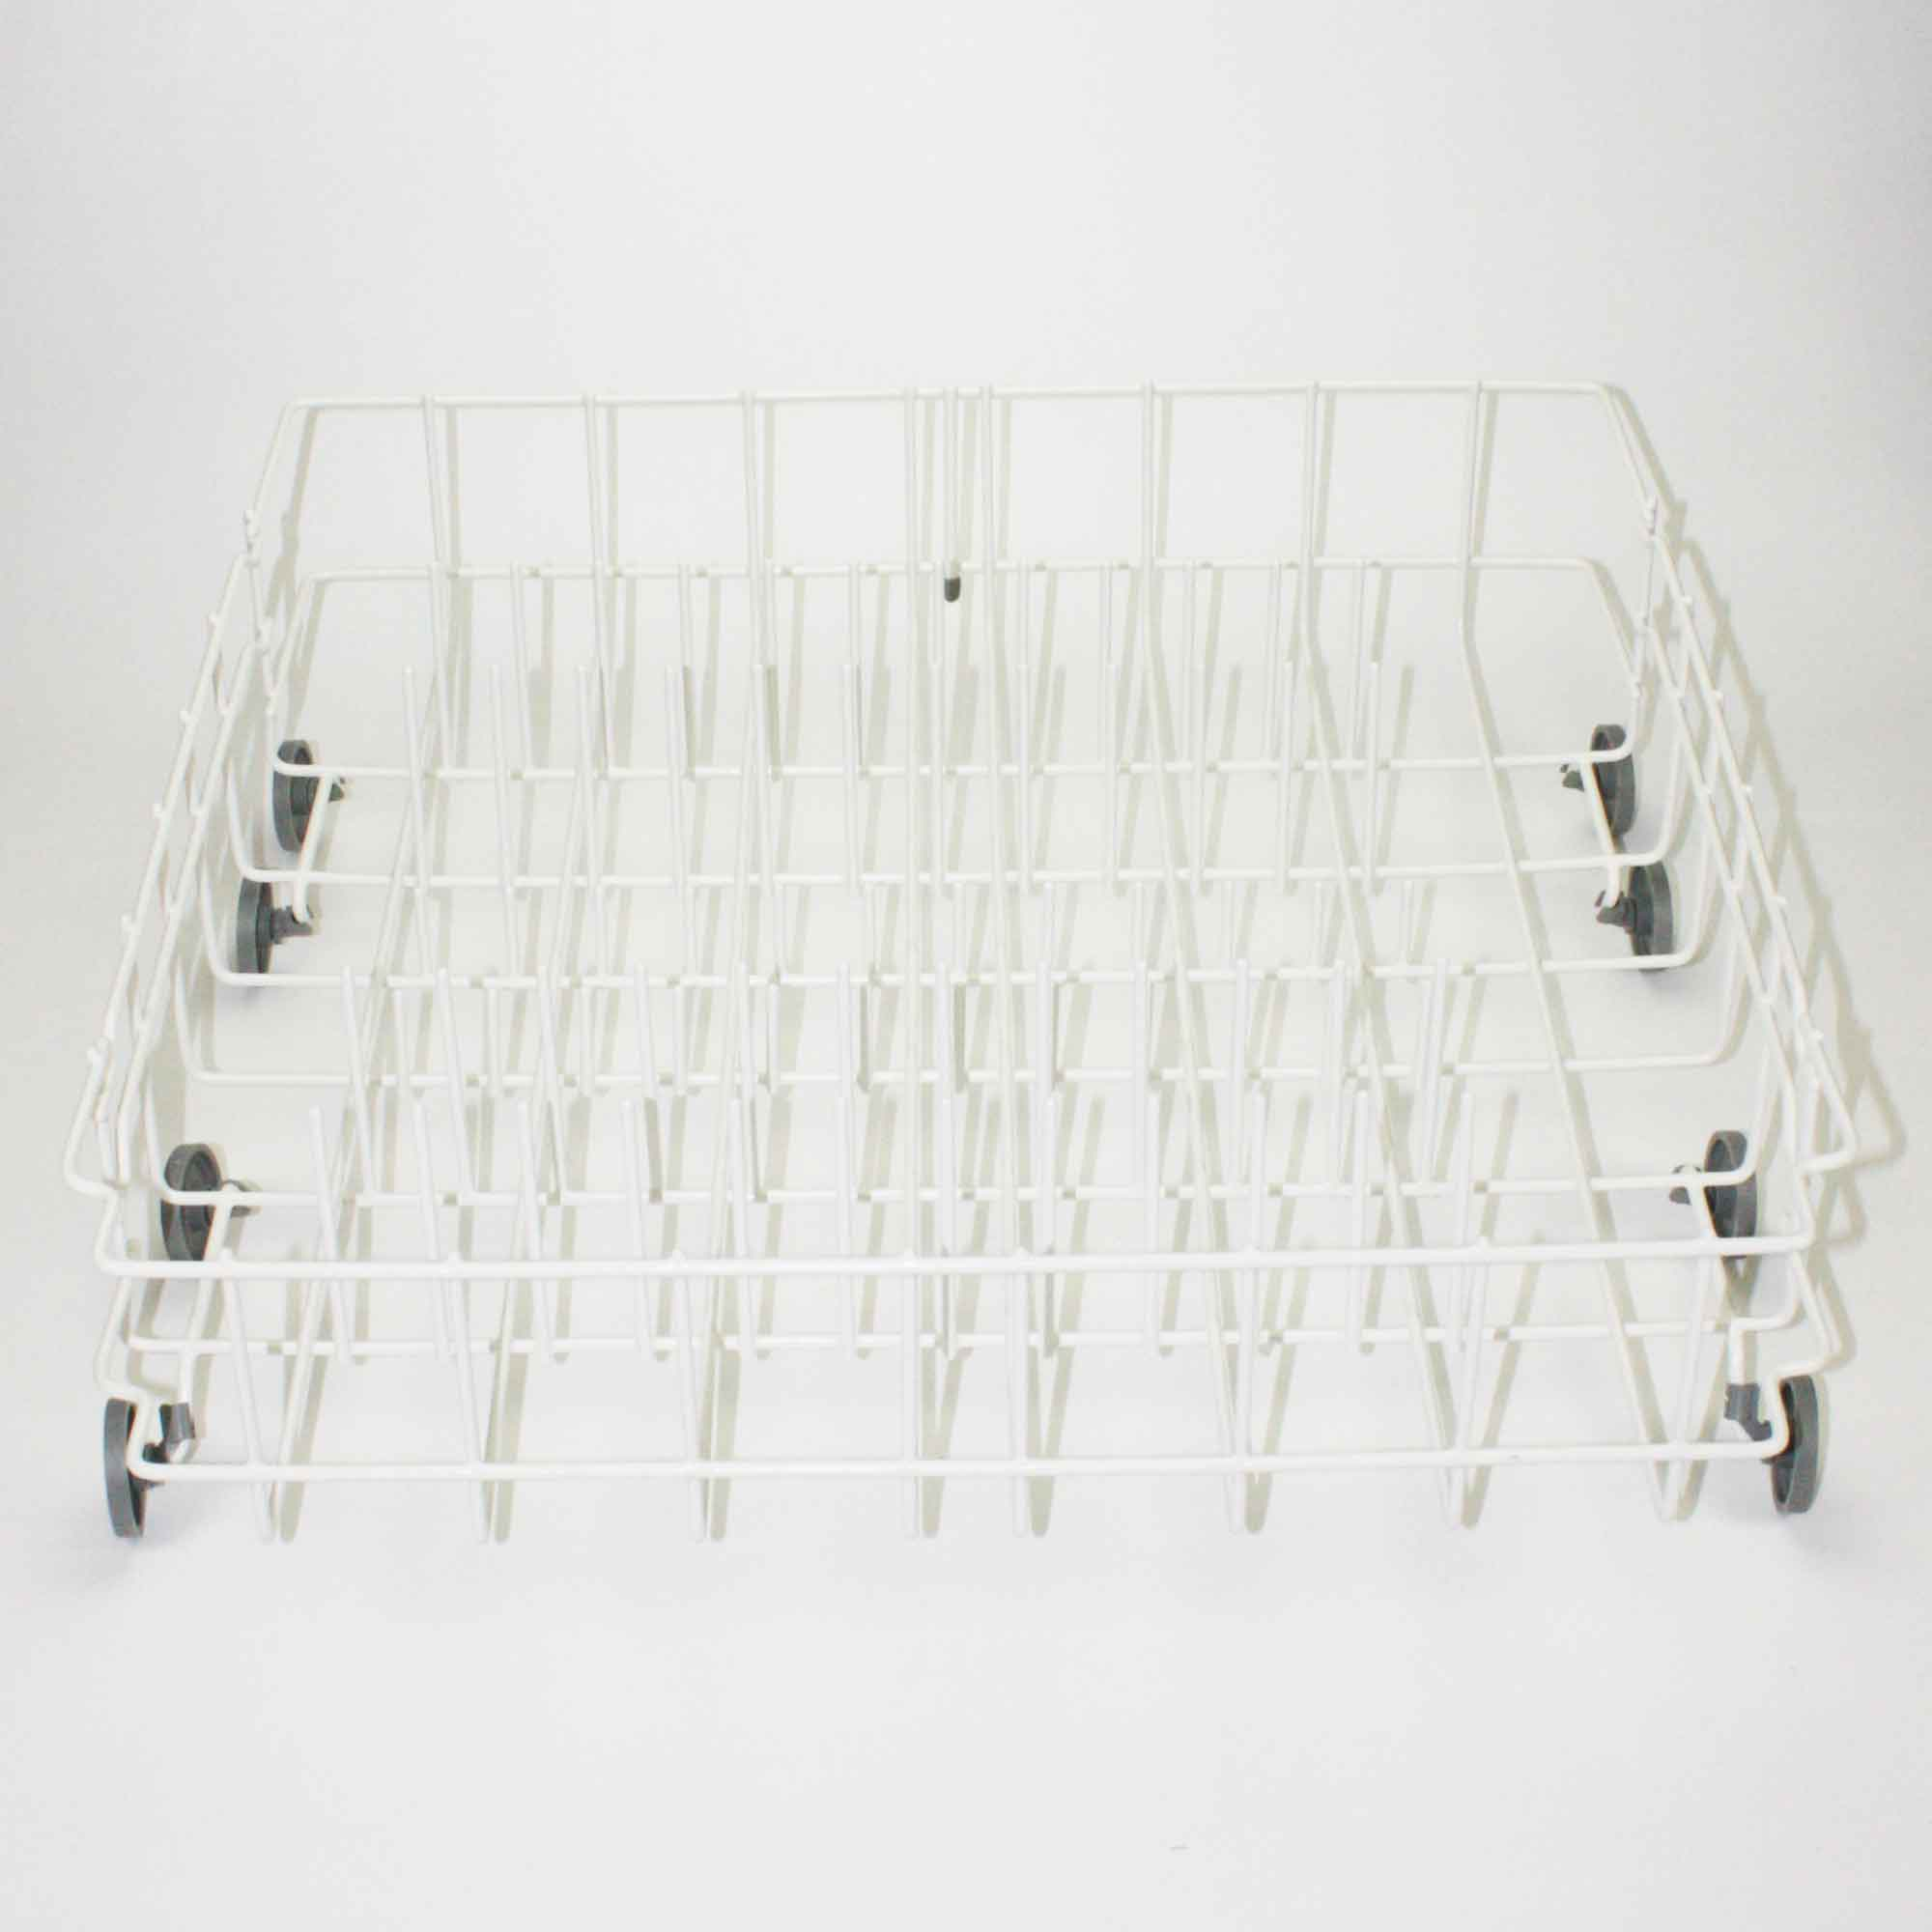 154331605 For Frigidaire Dishwasher Lower Dishrack